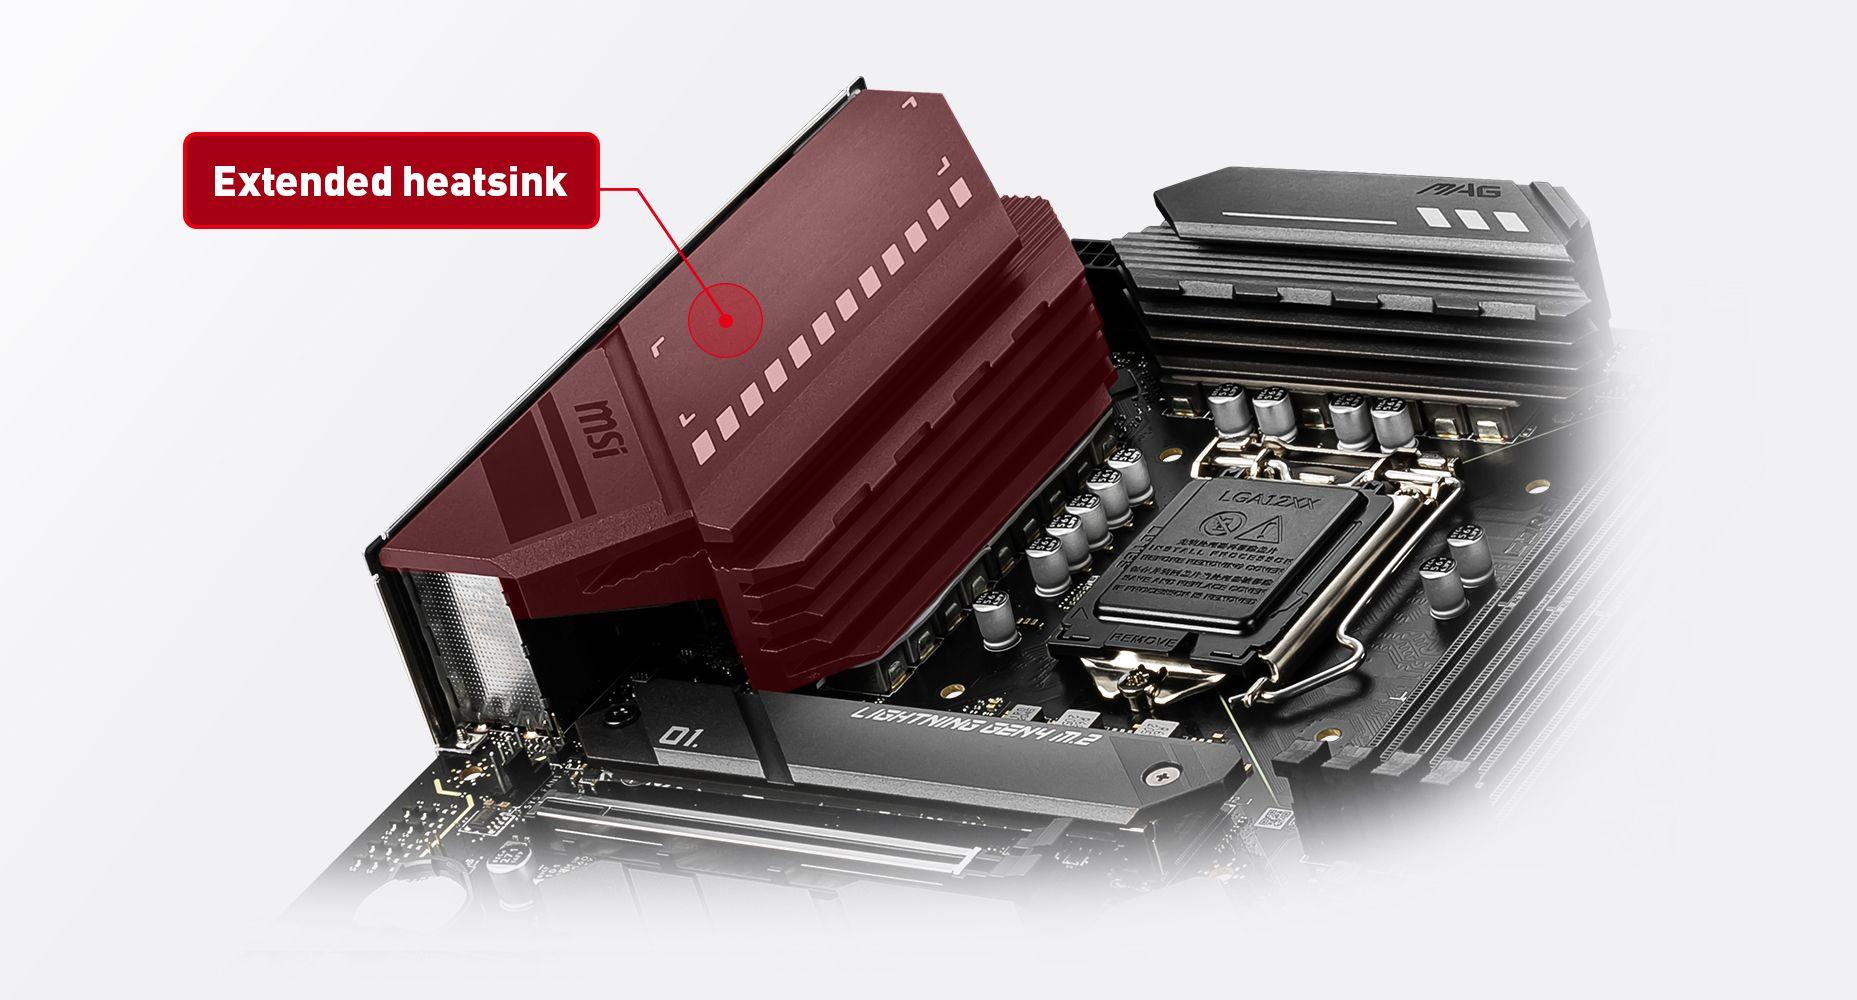 MSI MAG Z590 TOMAHAWK WIFI EXTENDED HEATSINK